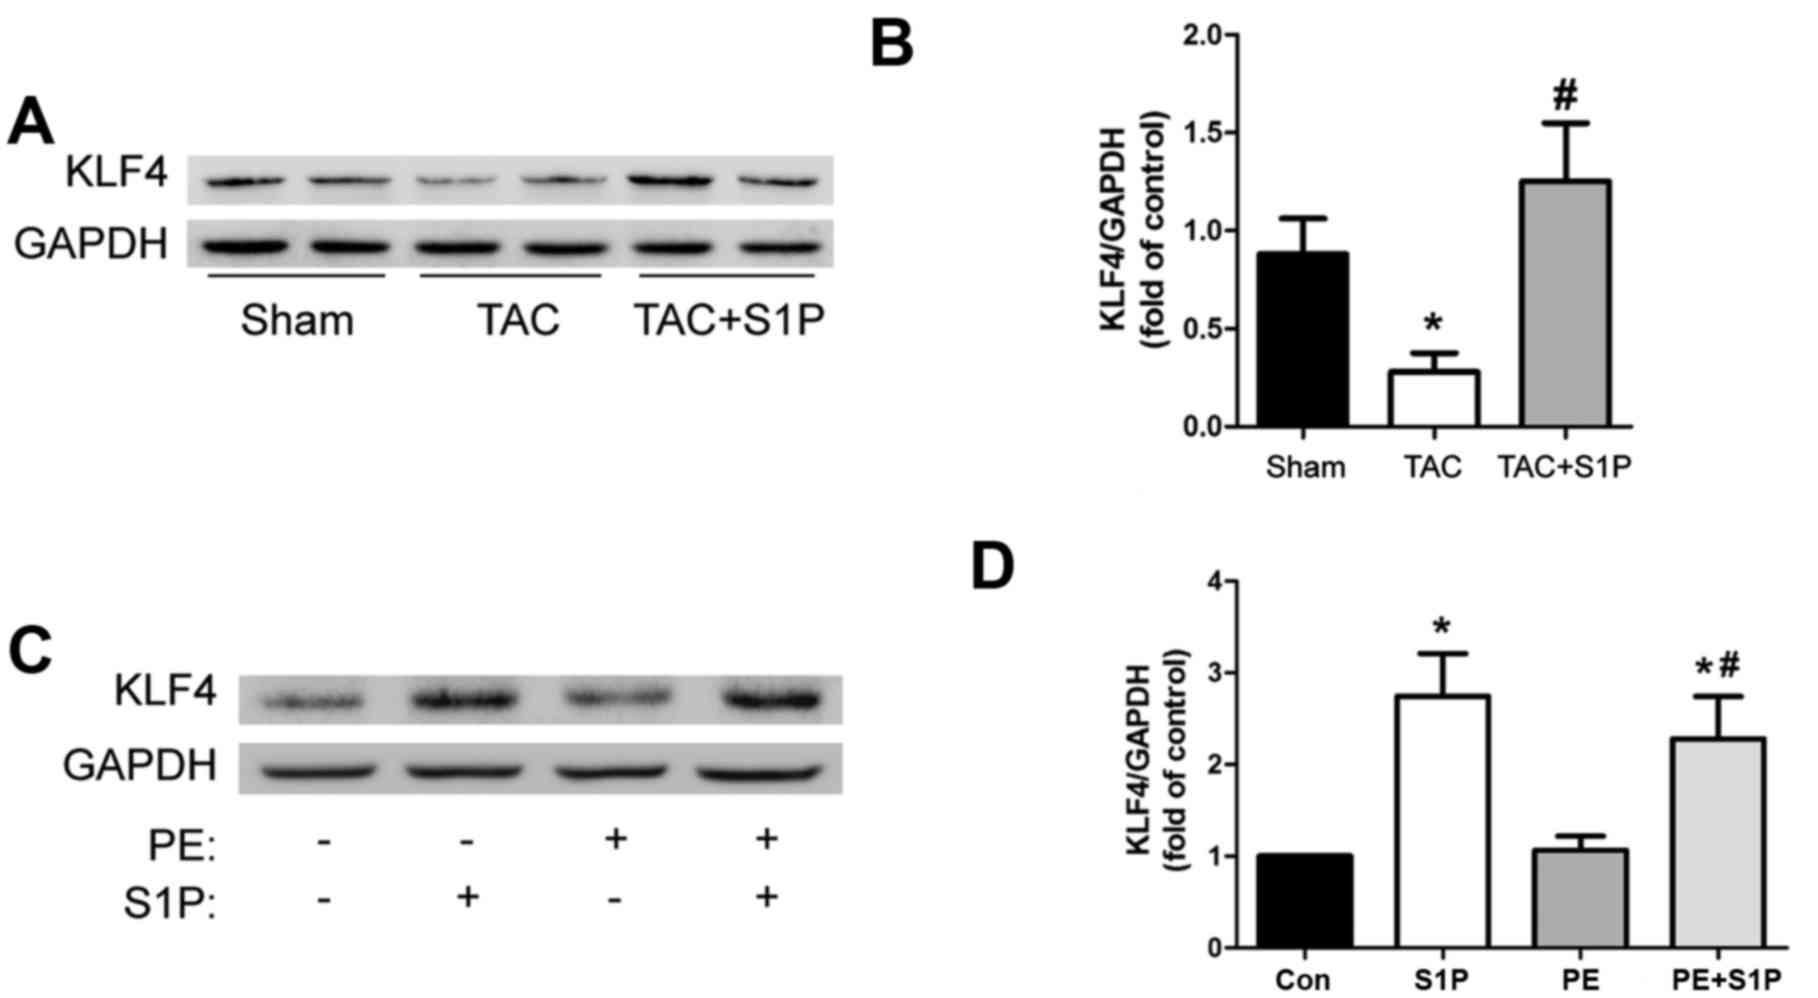 Sphingosine-1-phosphate ameliorates the cardiac hypertrophic